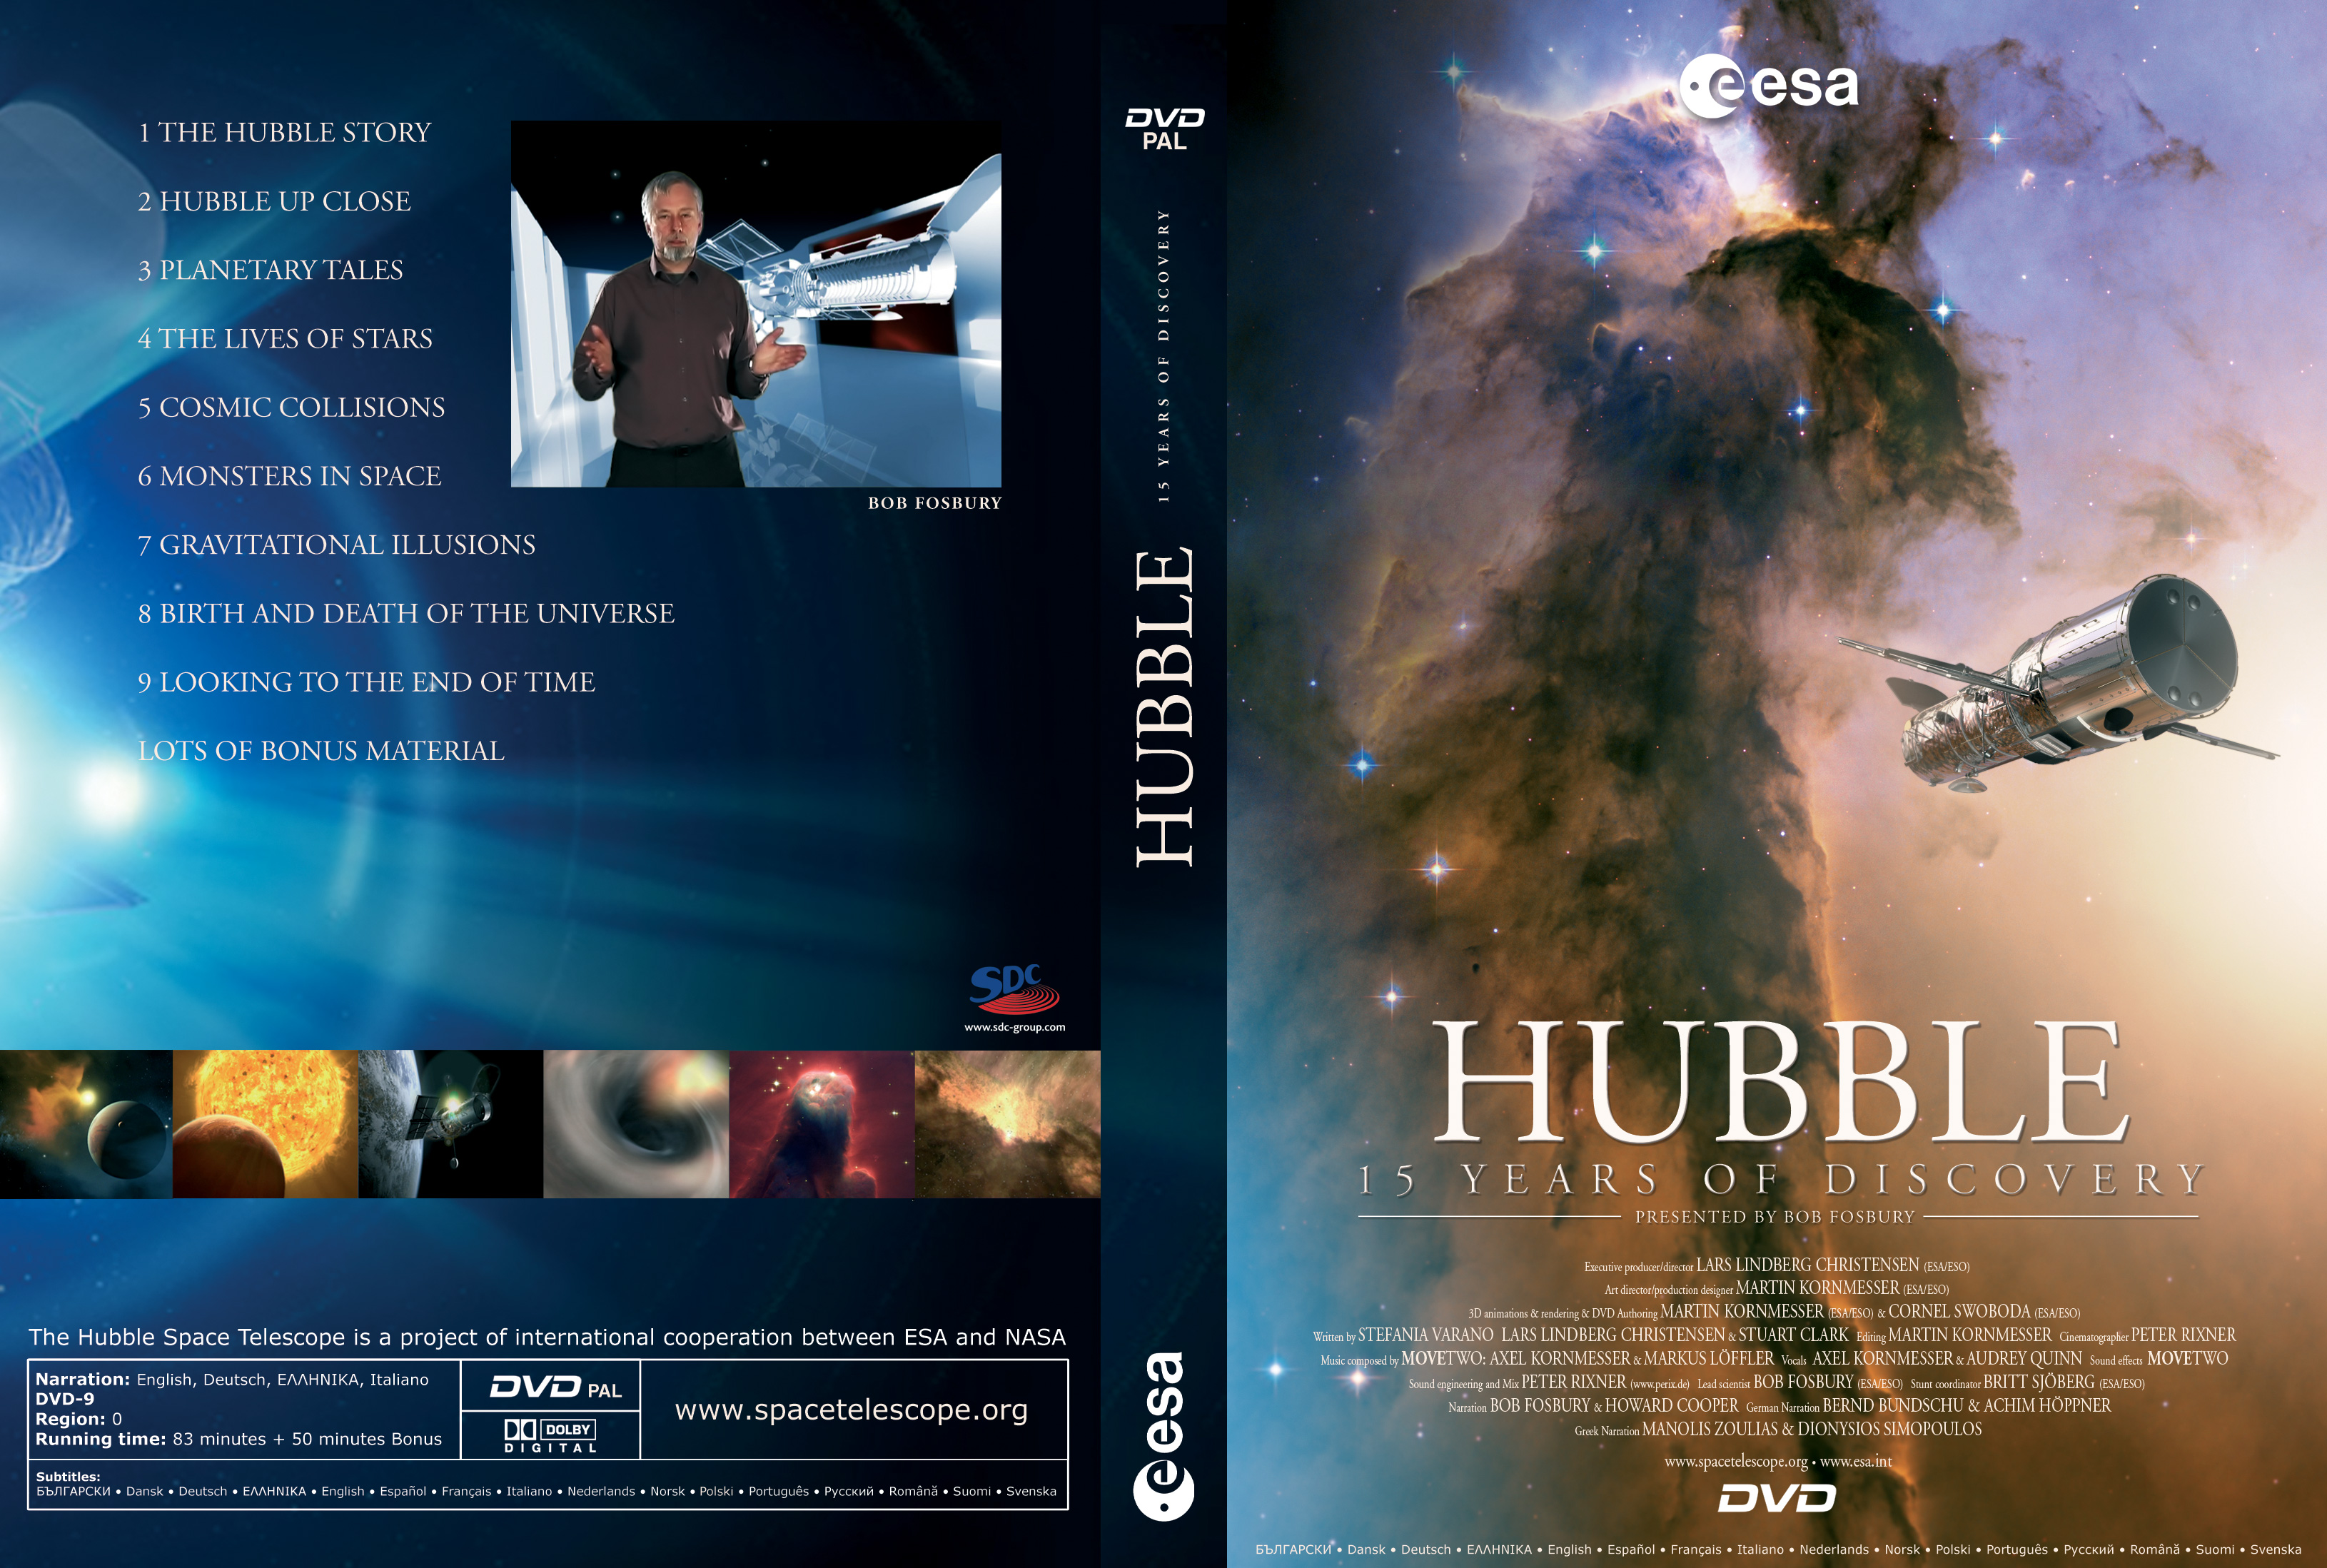 The Movie Esa Hubble Esa Hubble